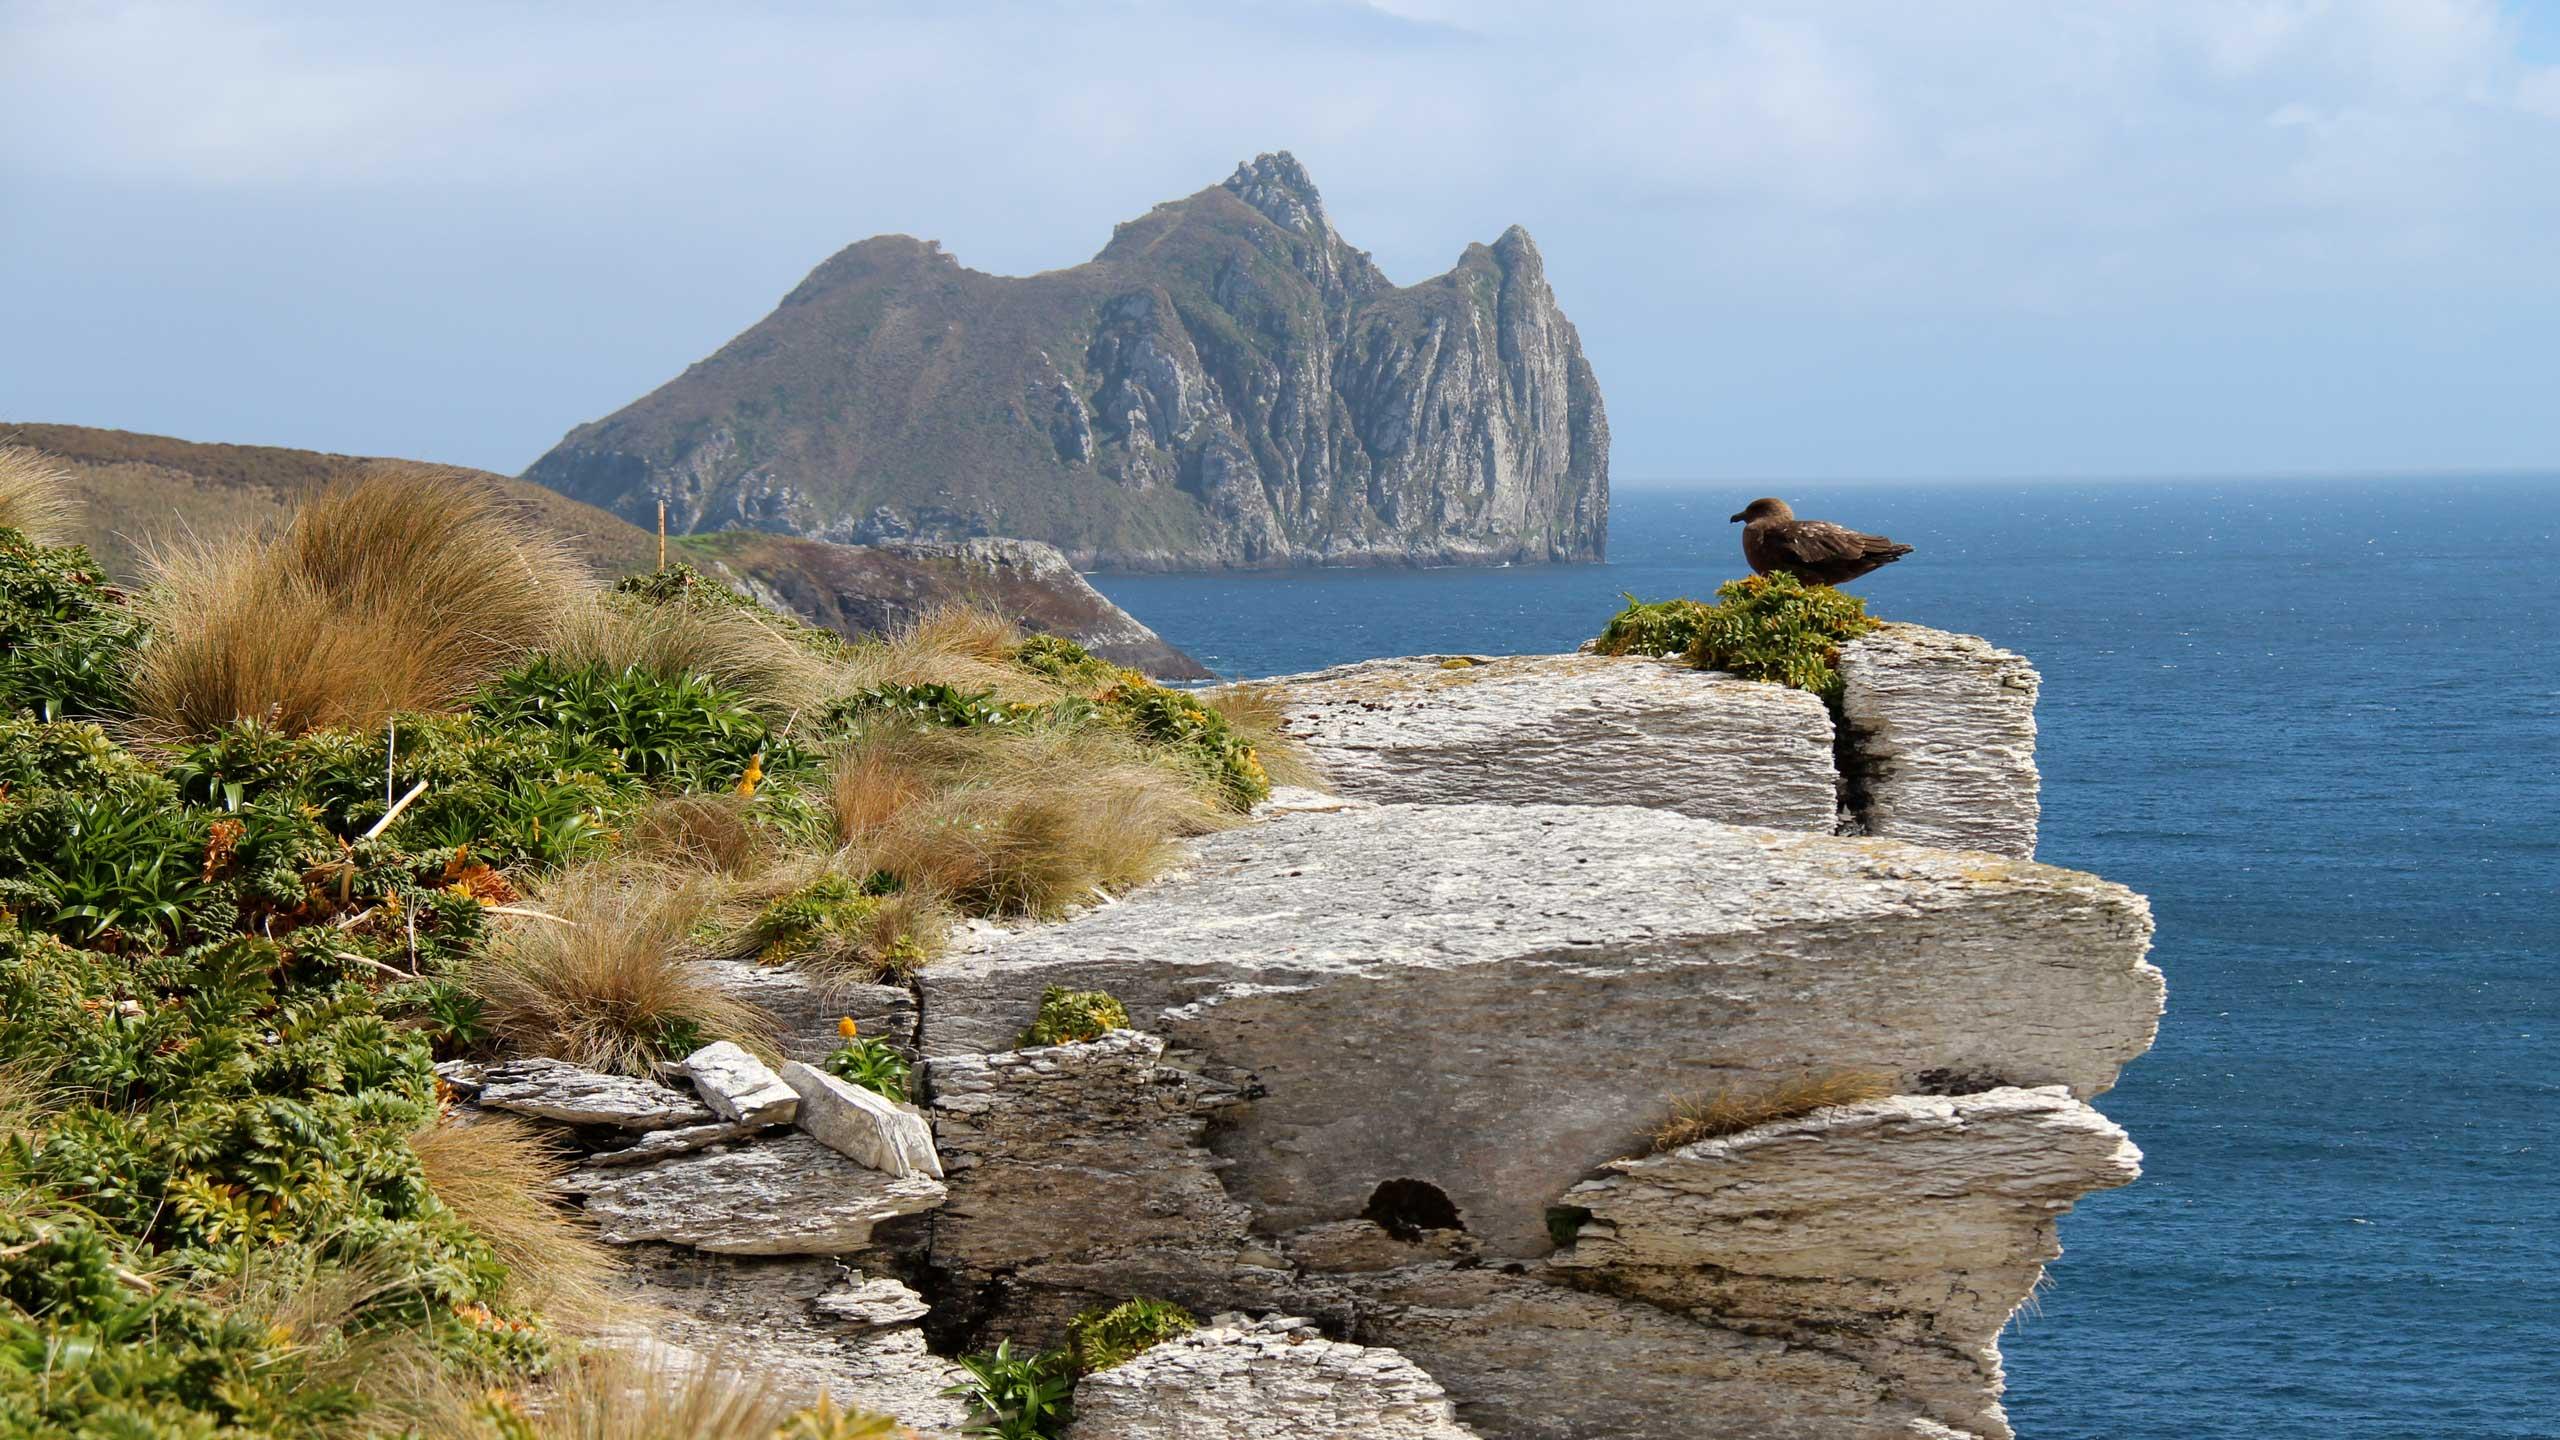 Subantarctic Islands